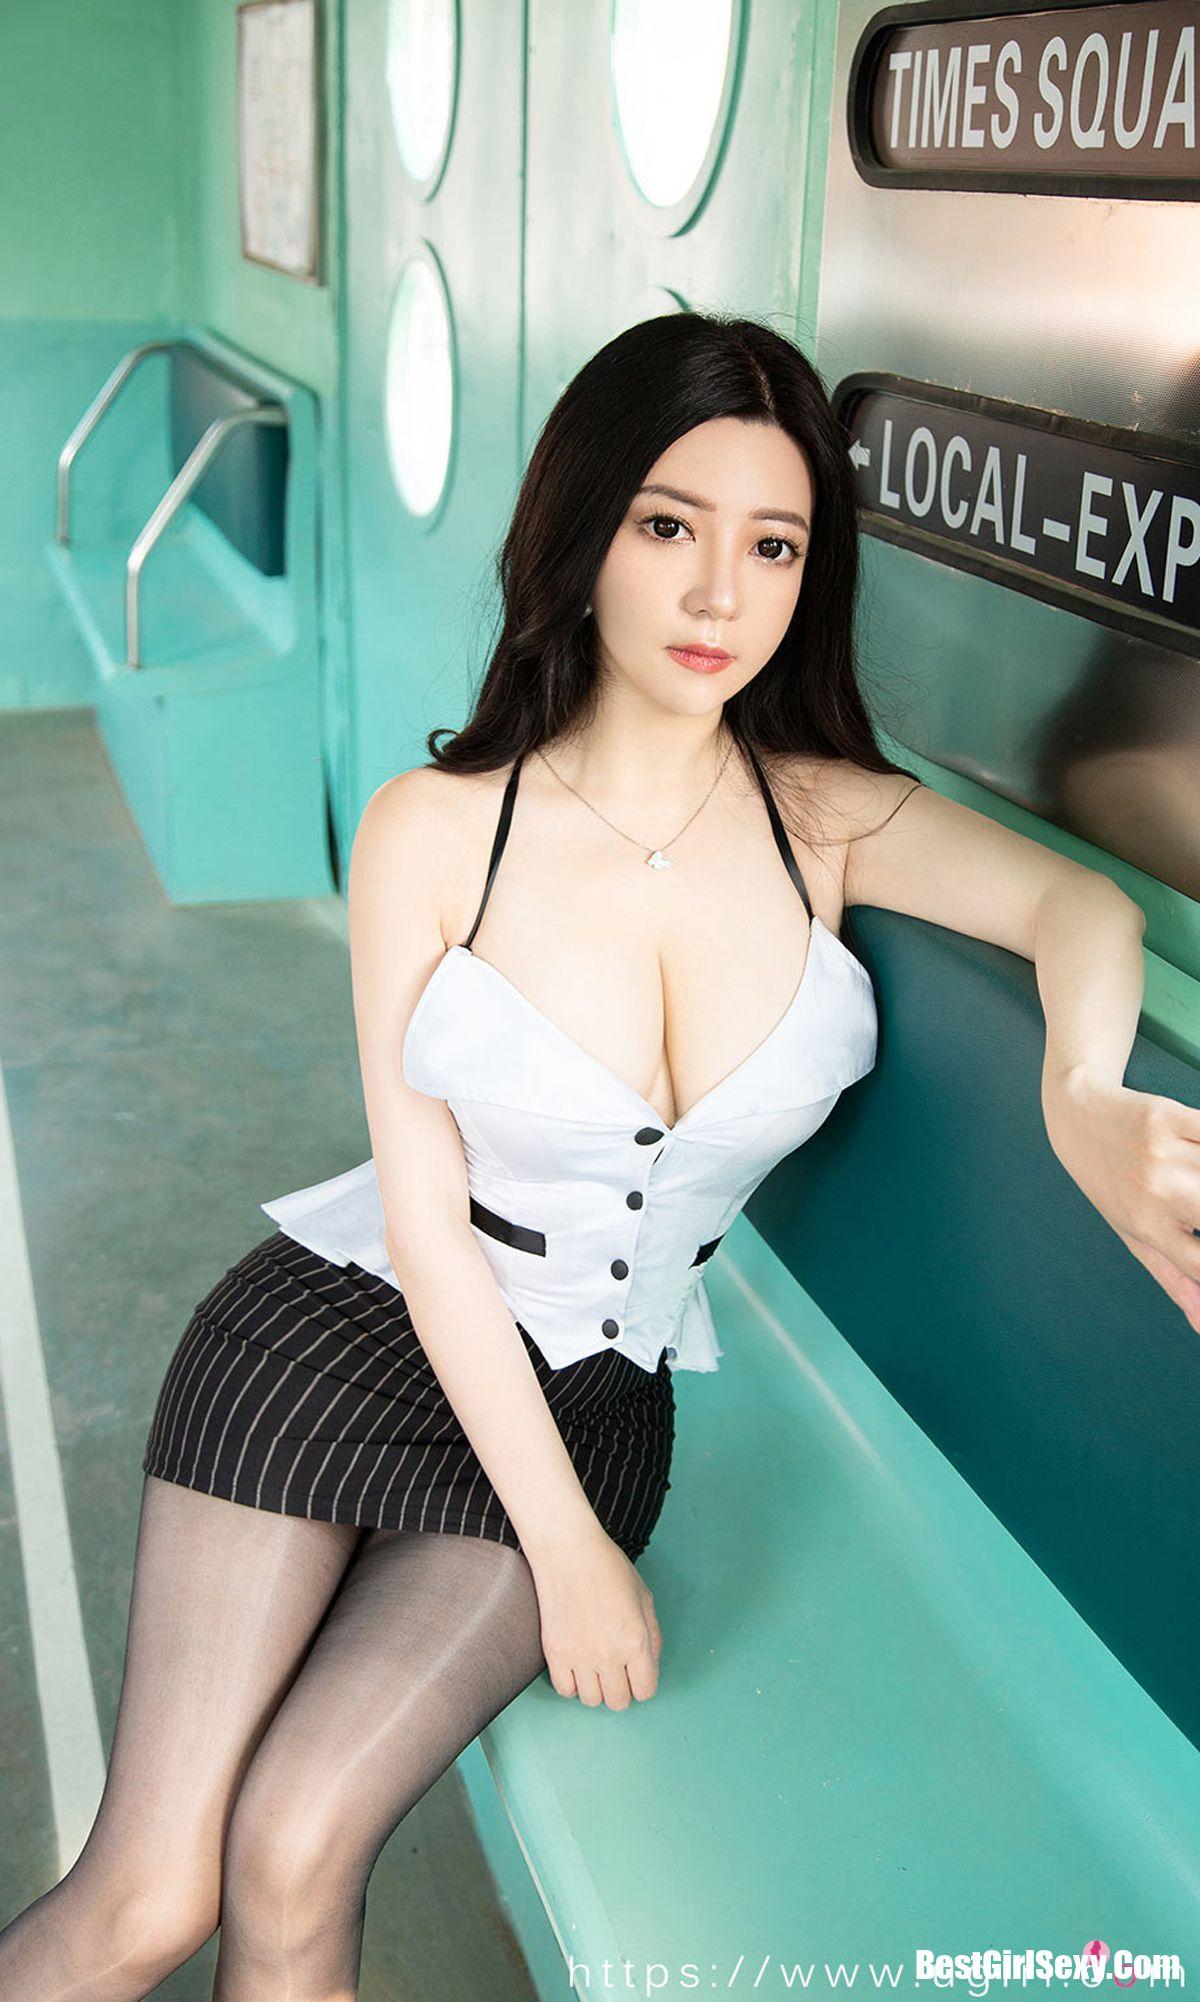 Ugirls爱尤物 No.2076 Lu Lu, Ugirls爱尤物 No.2076 Lu, Lu Lu